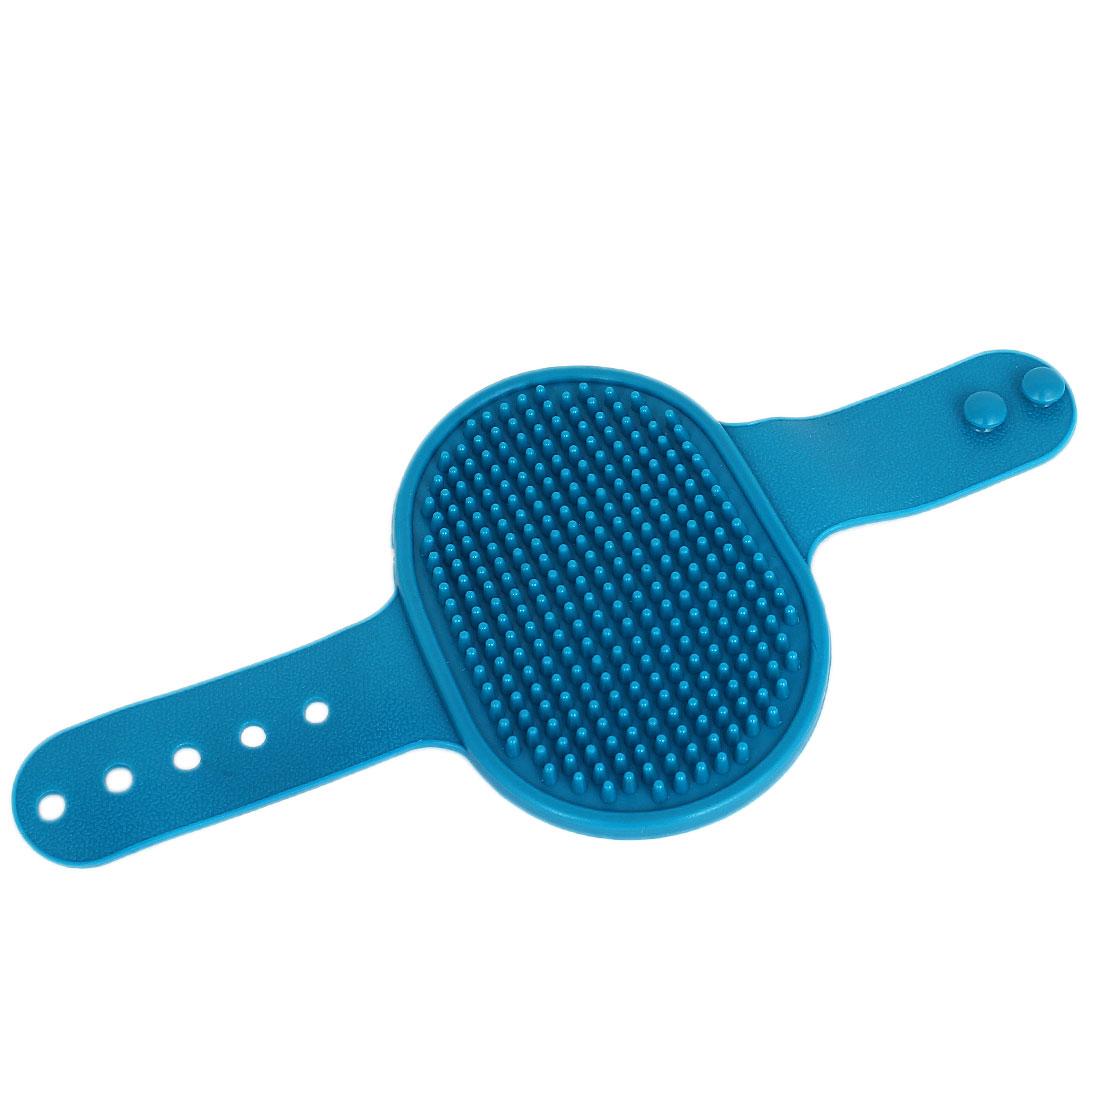 Adjustable Rubber Massage Pet Cat Dog Fur Hair Grooming Bath Brush Comb Cyan